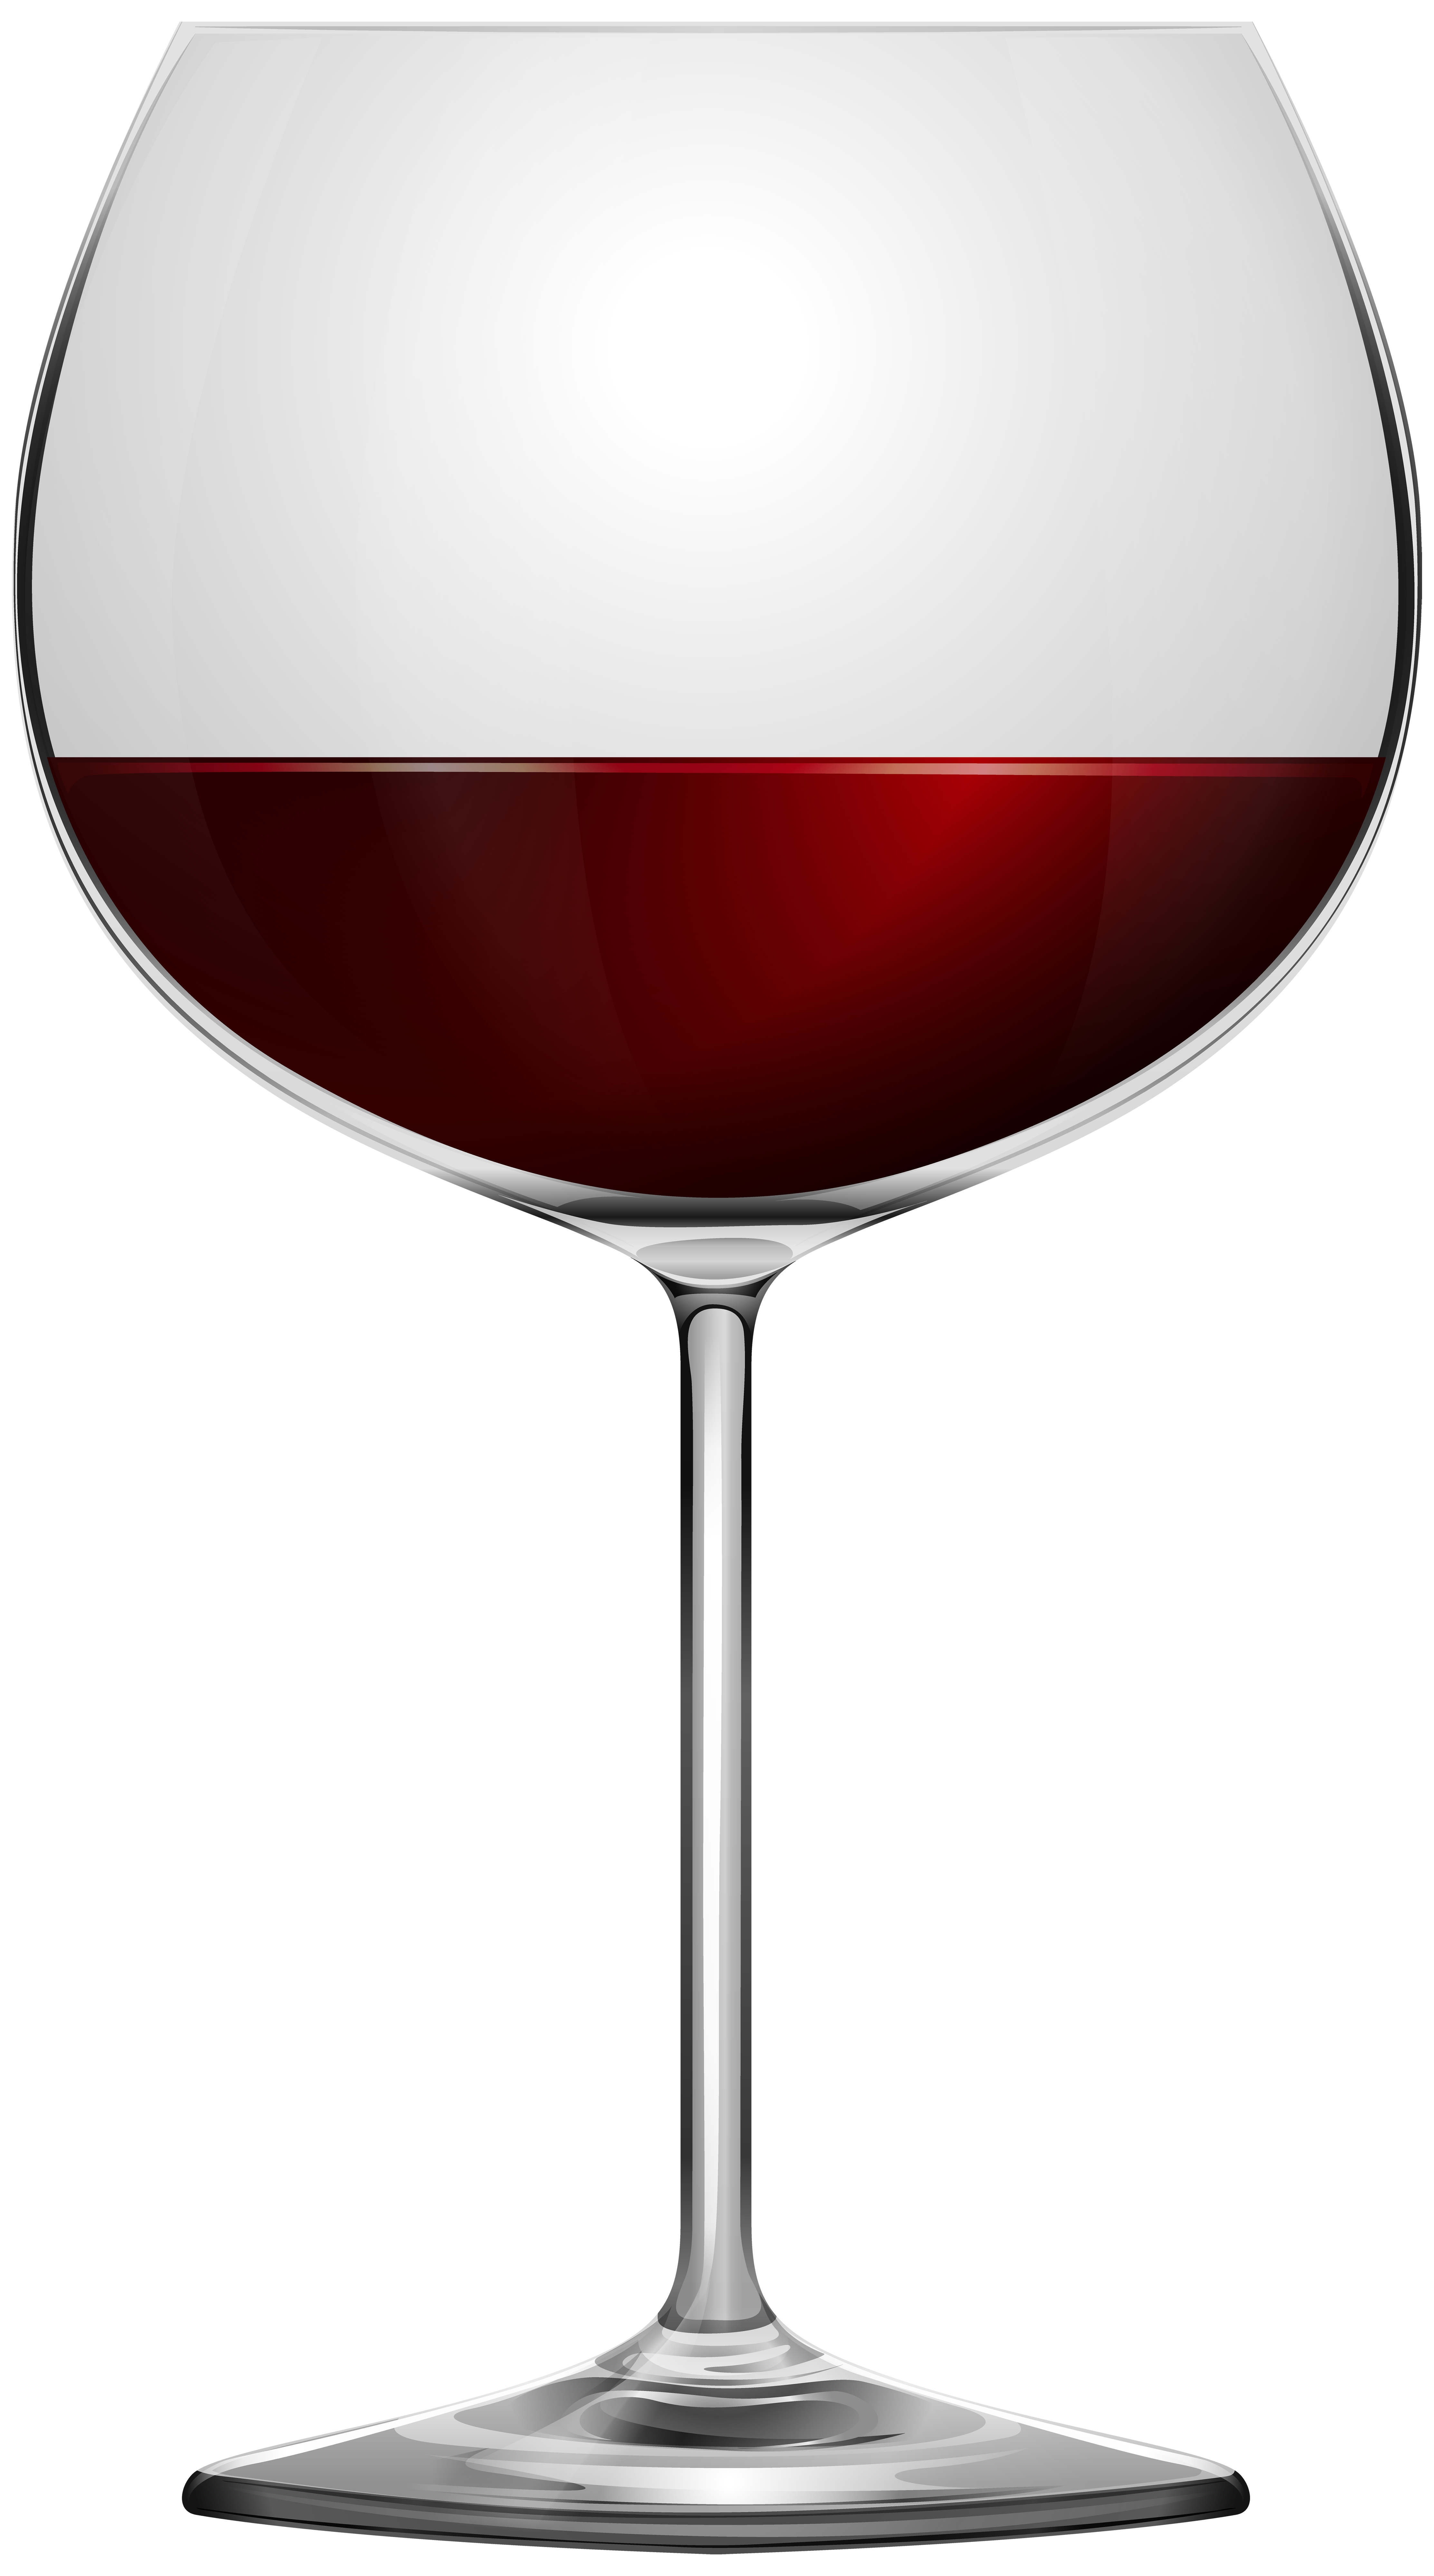 Gate clipart mandap. Red wine glass transparent